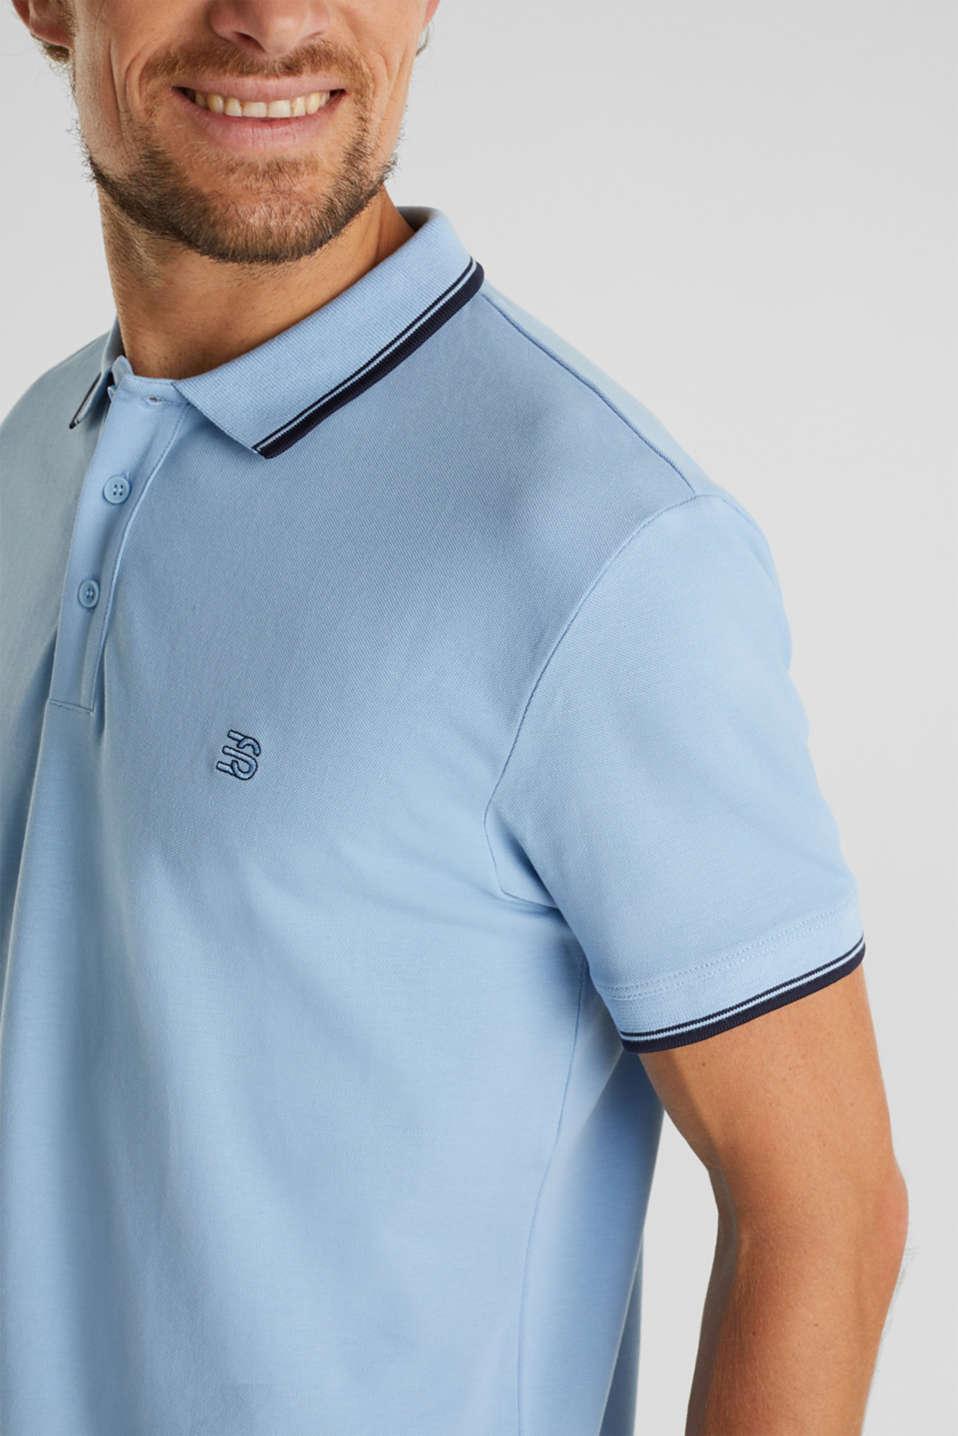 Piqué polo shirt in 100% cotton, LIGHT BLUE, detail image number 1